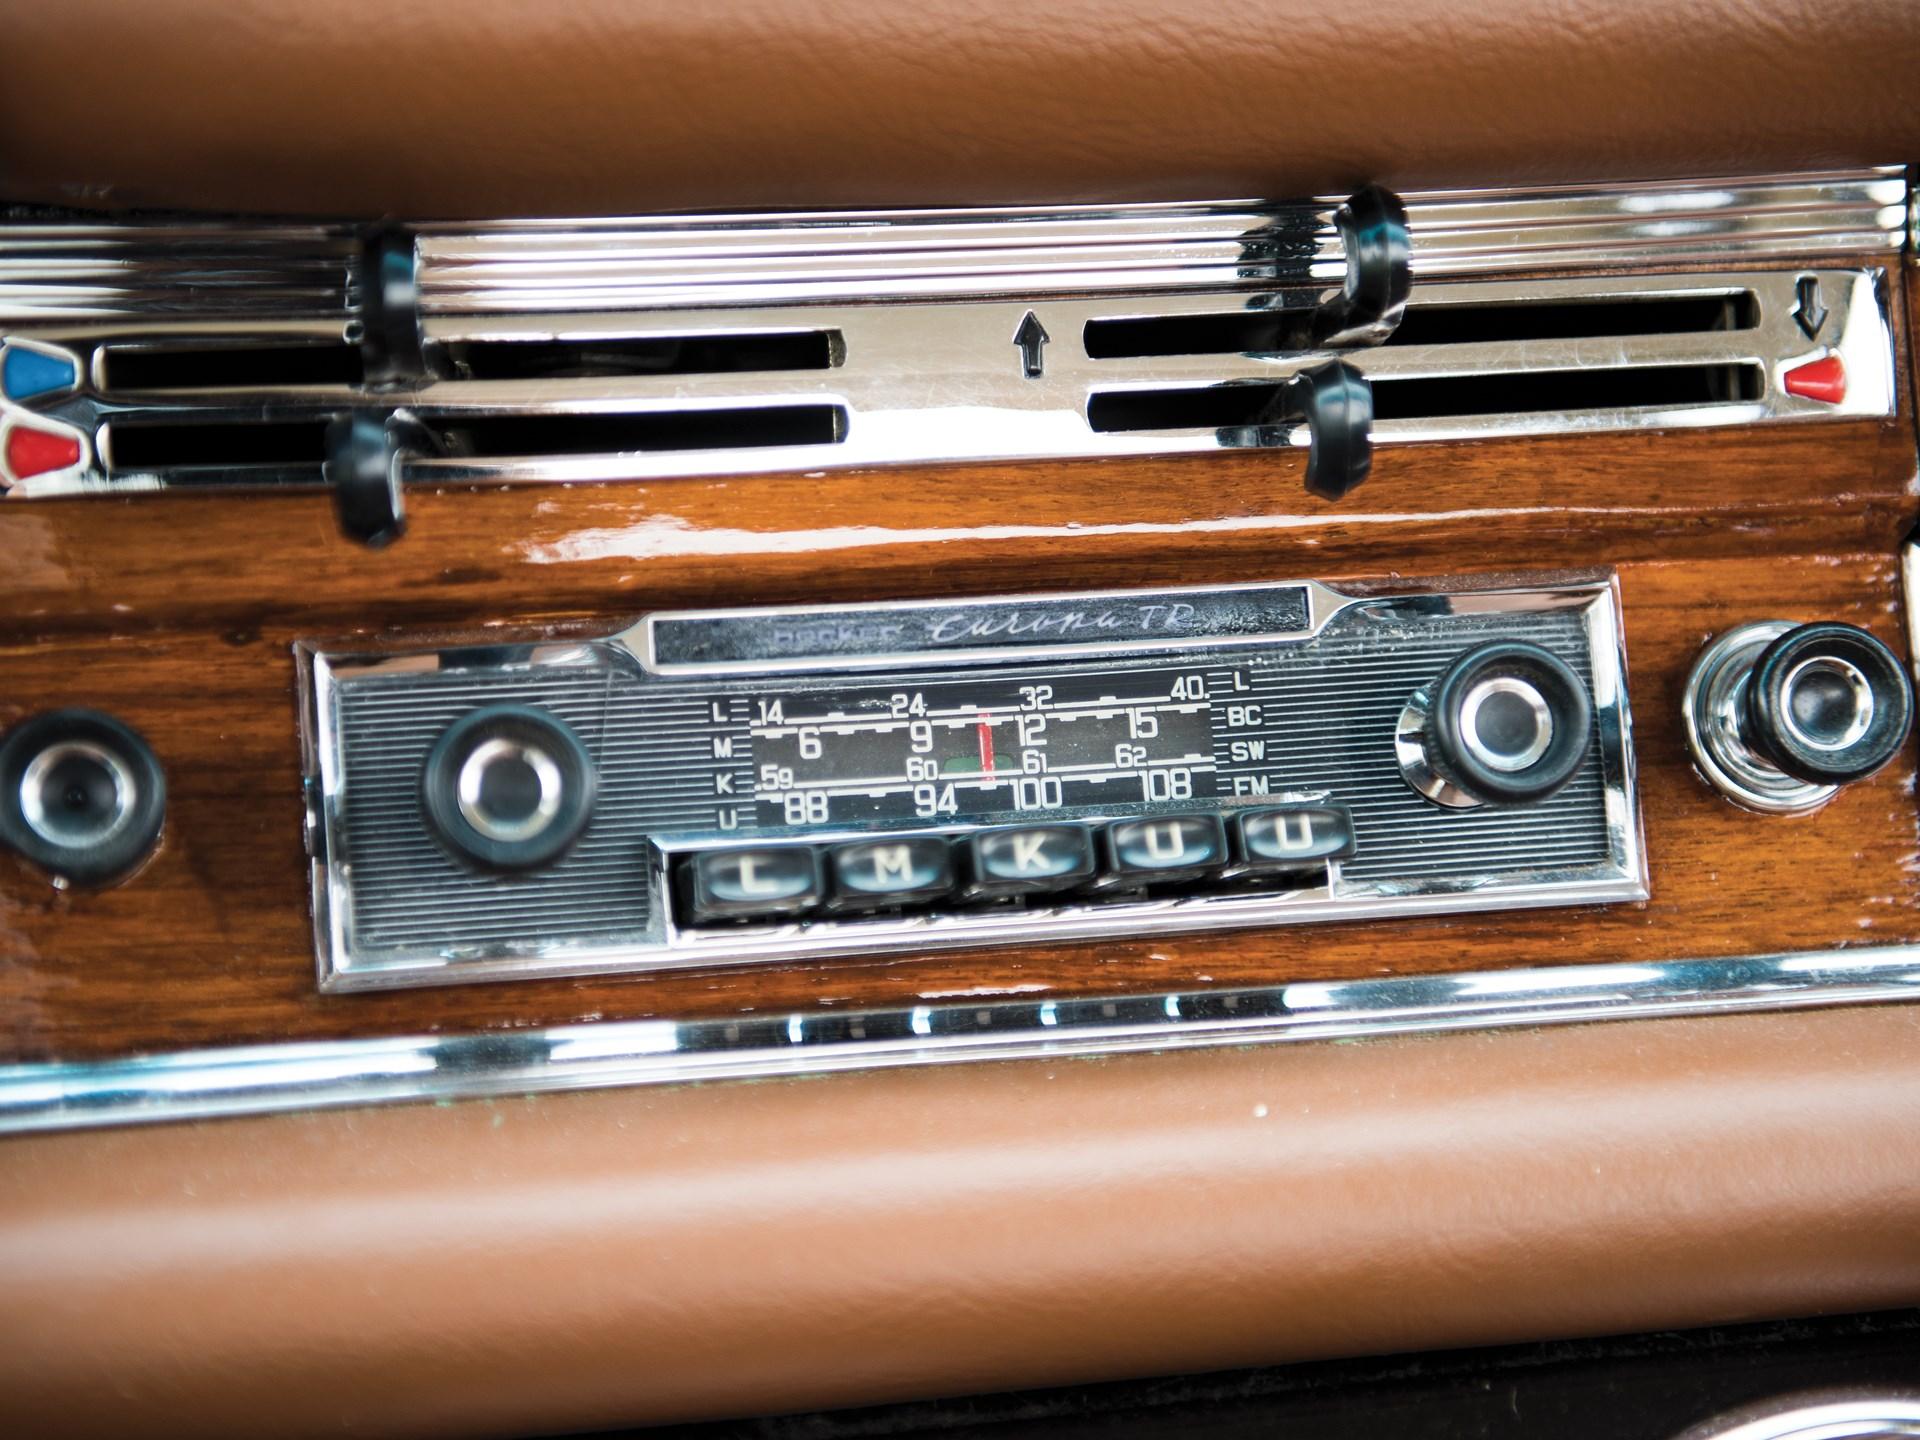 1965 Mercedes-Benz 220 SE Coupe